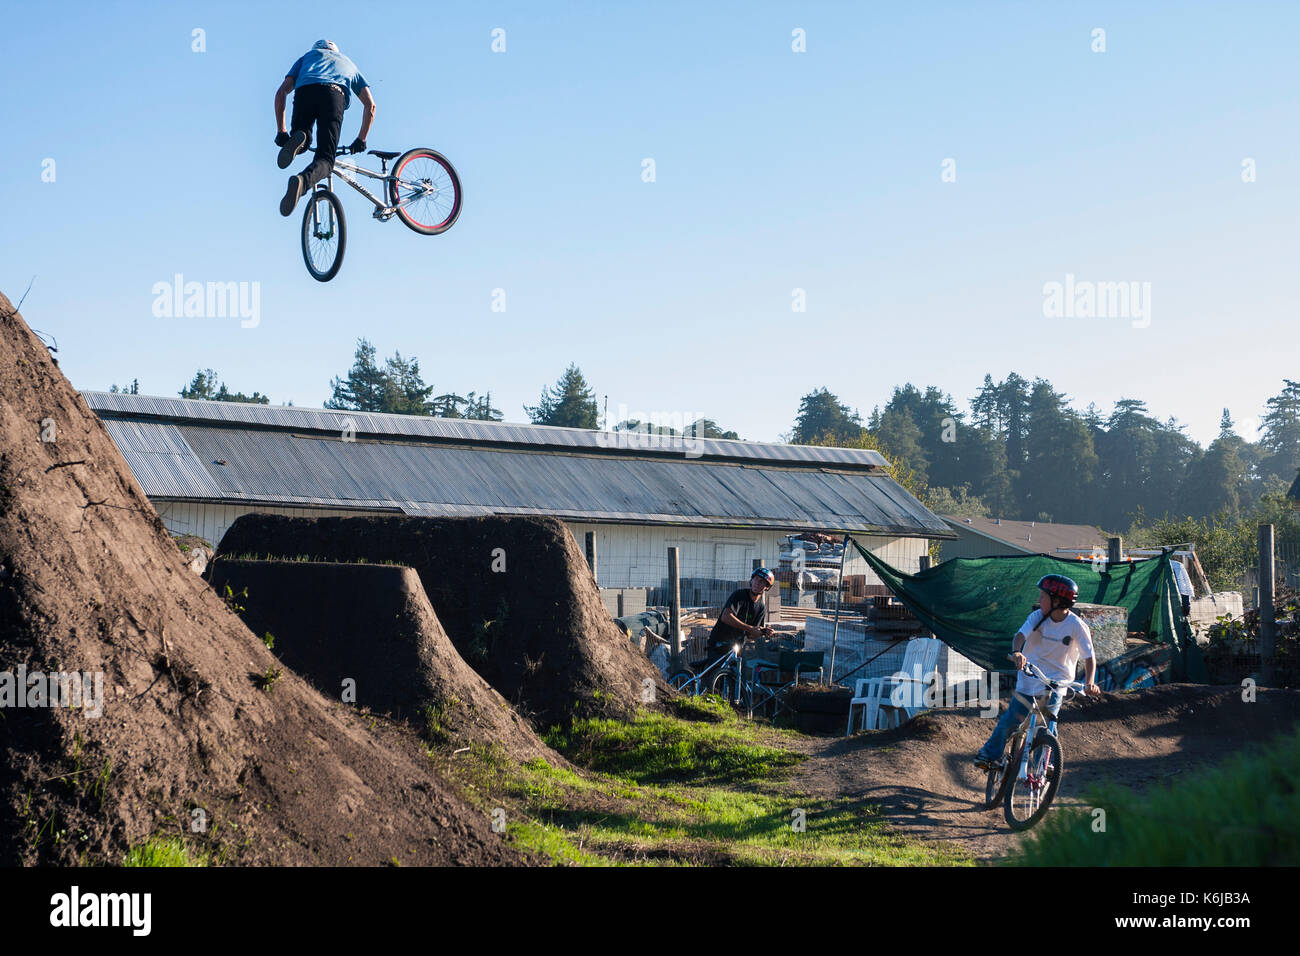 Rider doing bicycle trick mid air, Aptos, California, USA - Stock Image